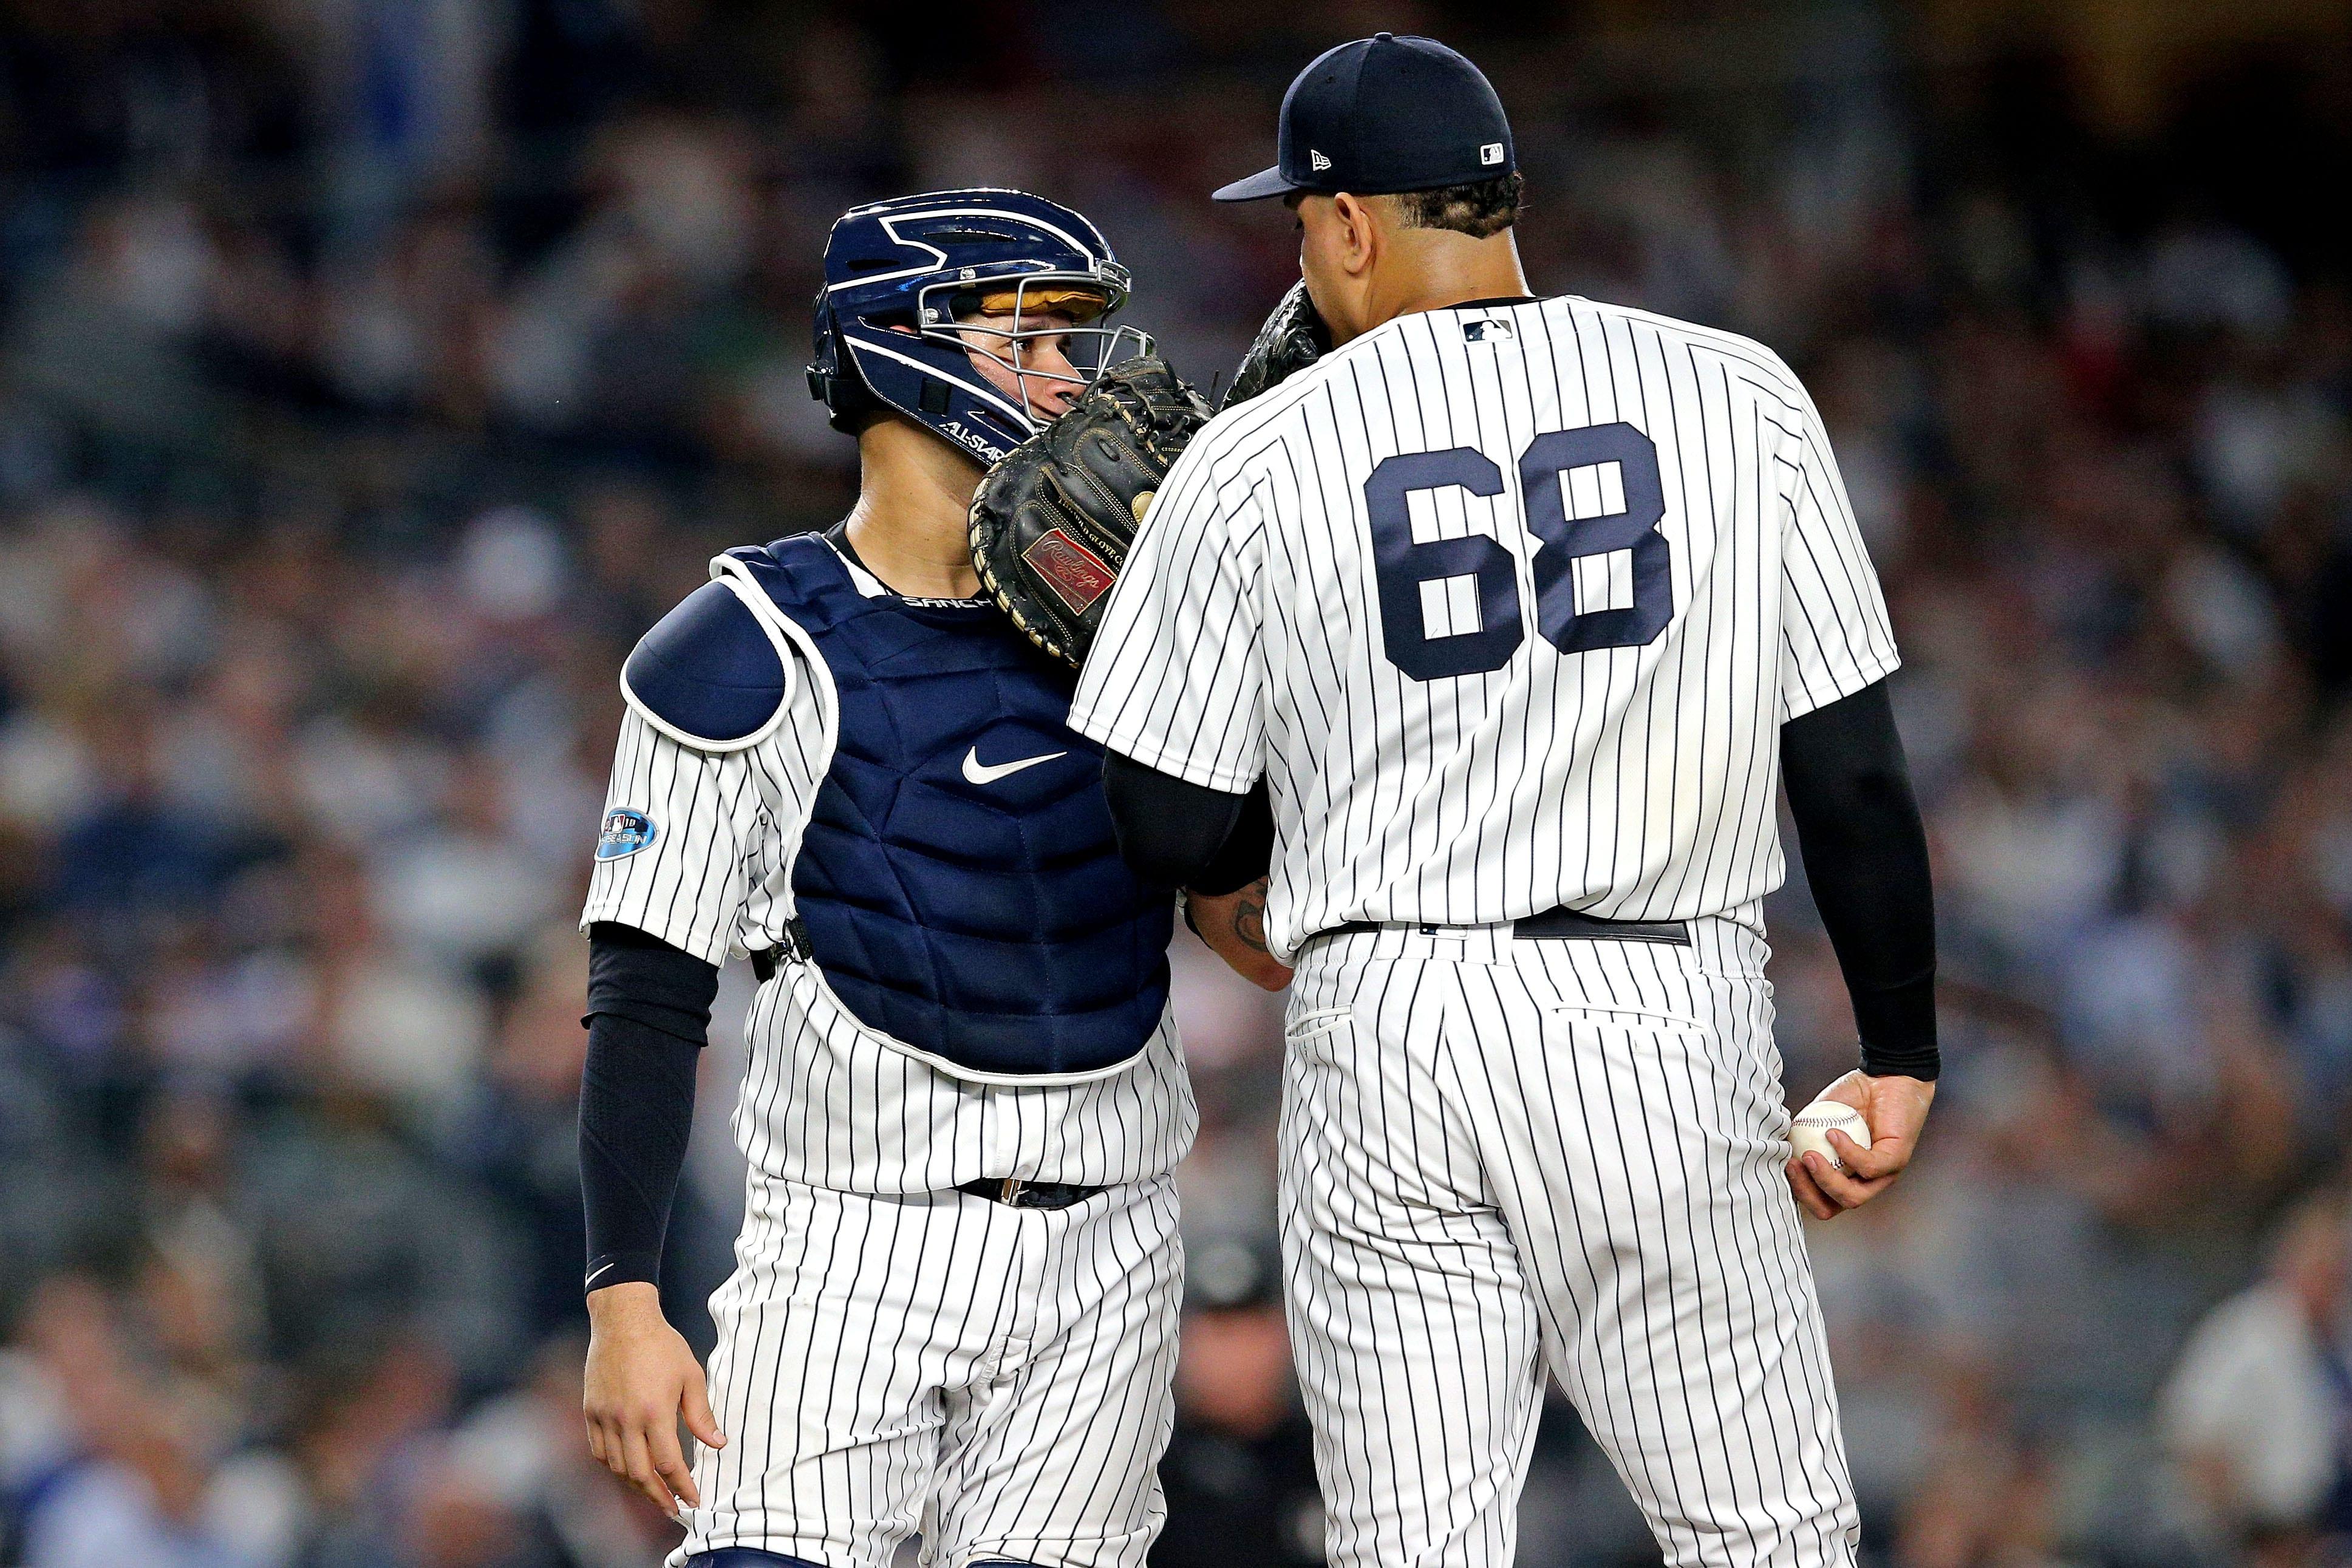 New York Yankees, Dellin Betances